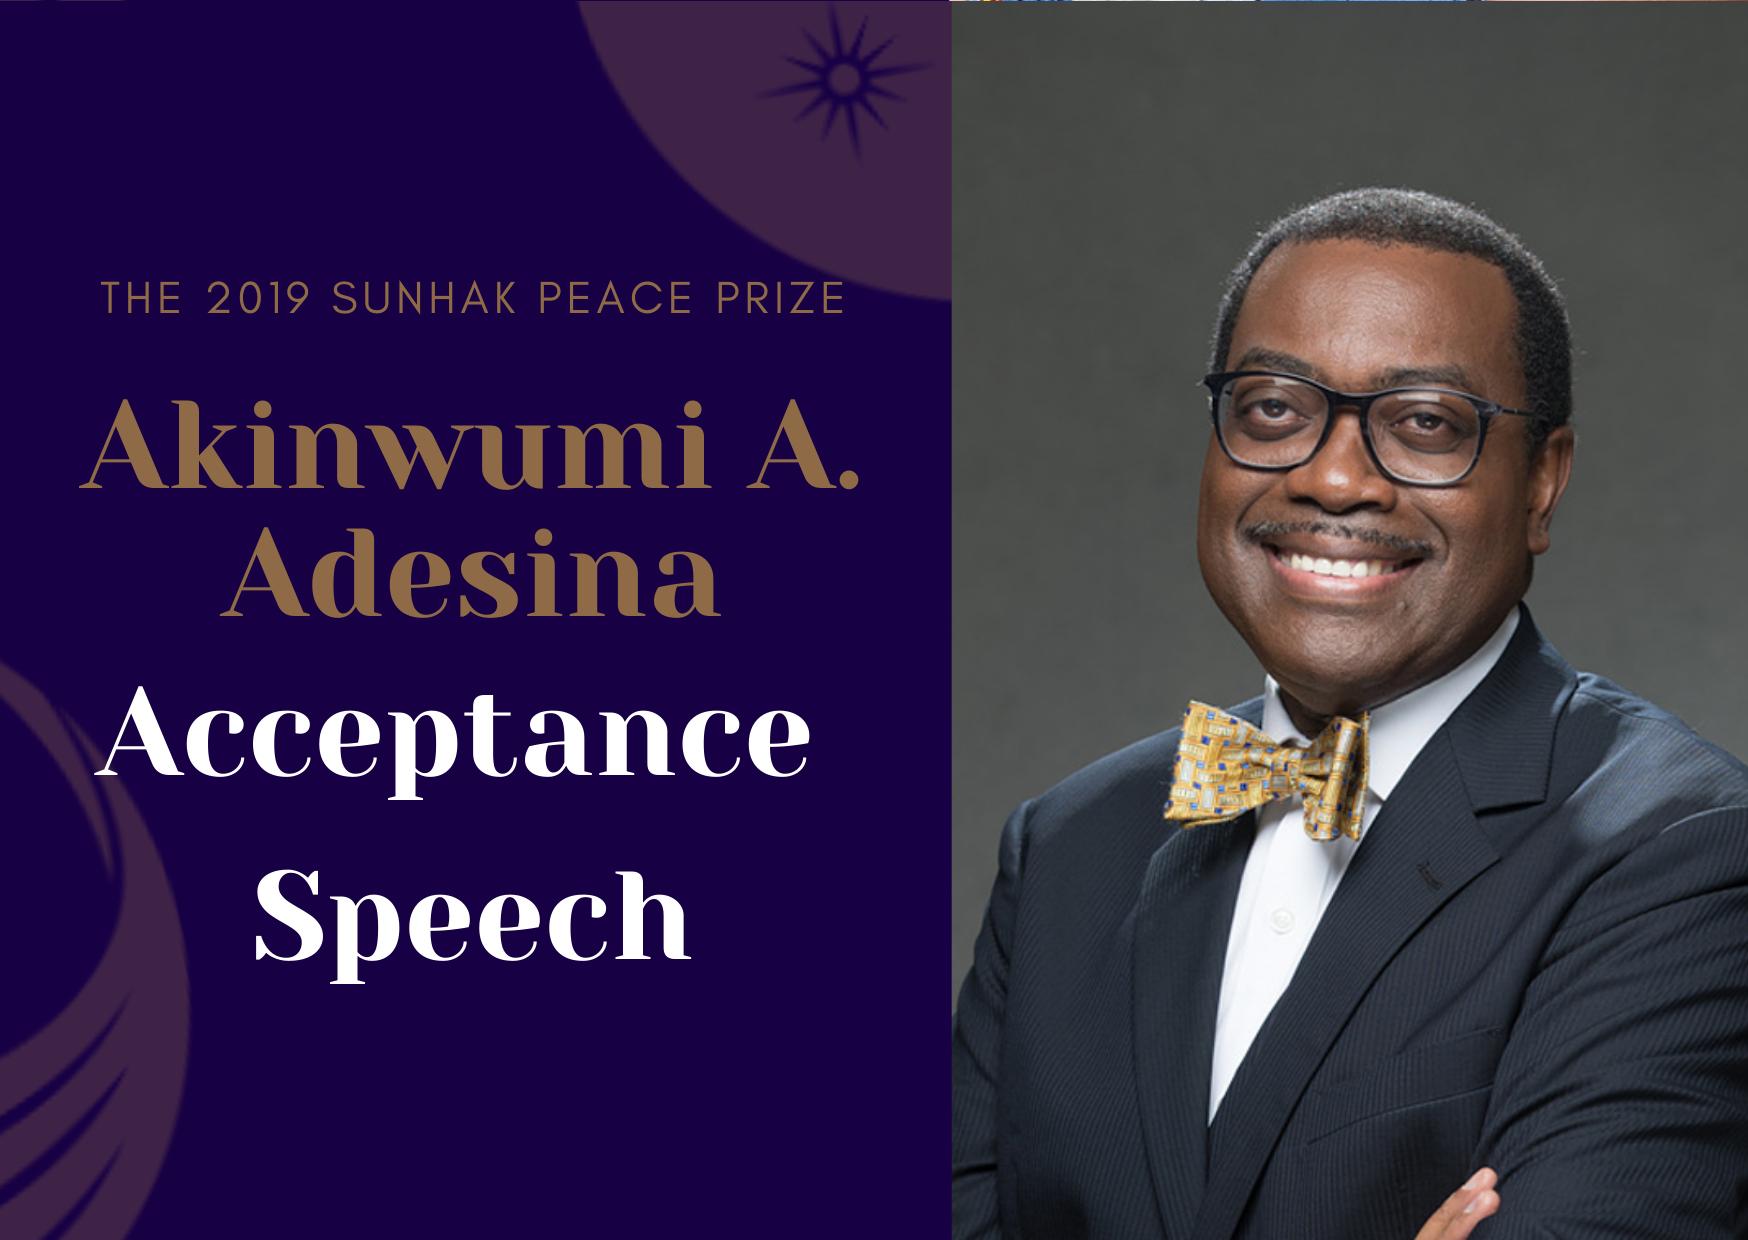 2019 Sunhak Peace Prize Laureate's Acceptance Speech - Dr. Akinwumi Adesina 썸네일